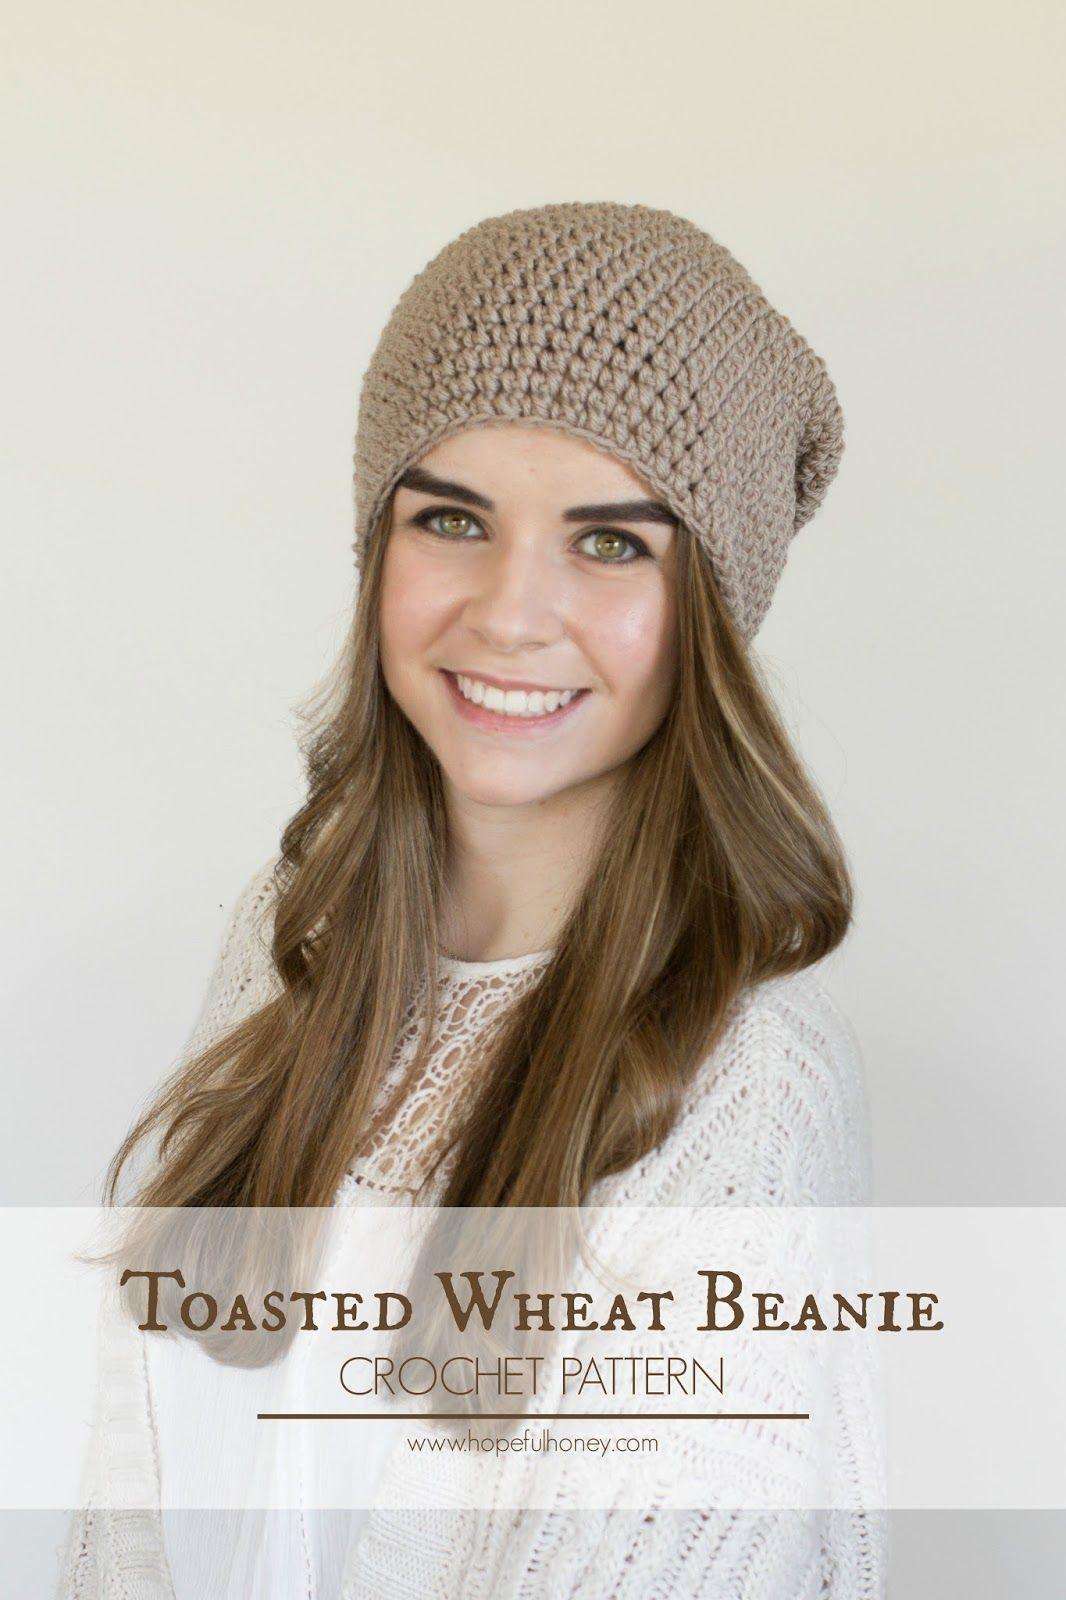 Toasted Wheat Slouchy Beanie - Free Crochet Pattern | Pinterest ...